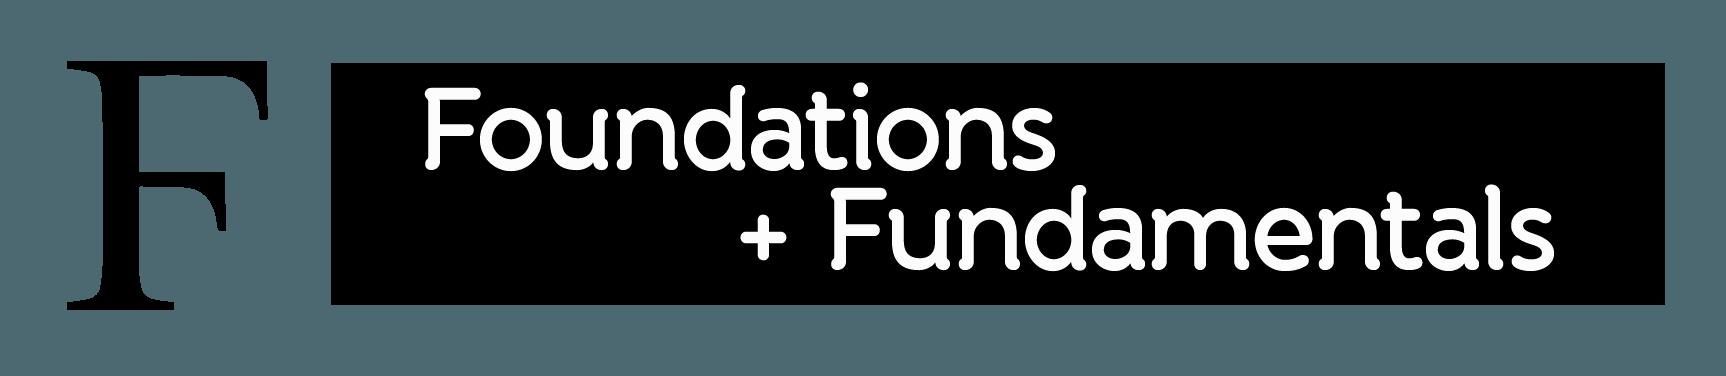 Foundations + Fundamentals